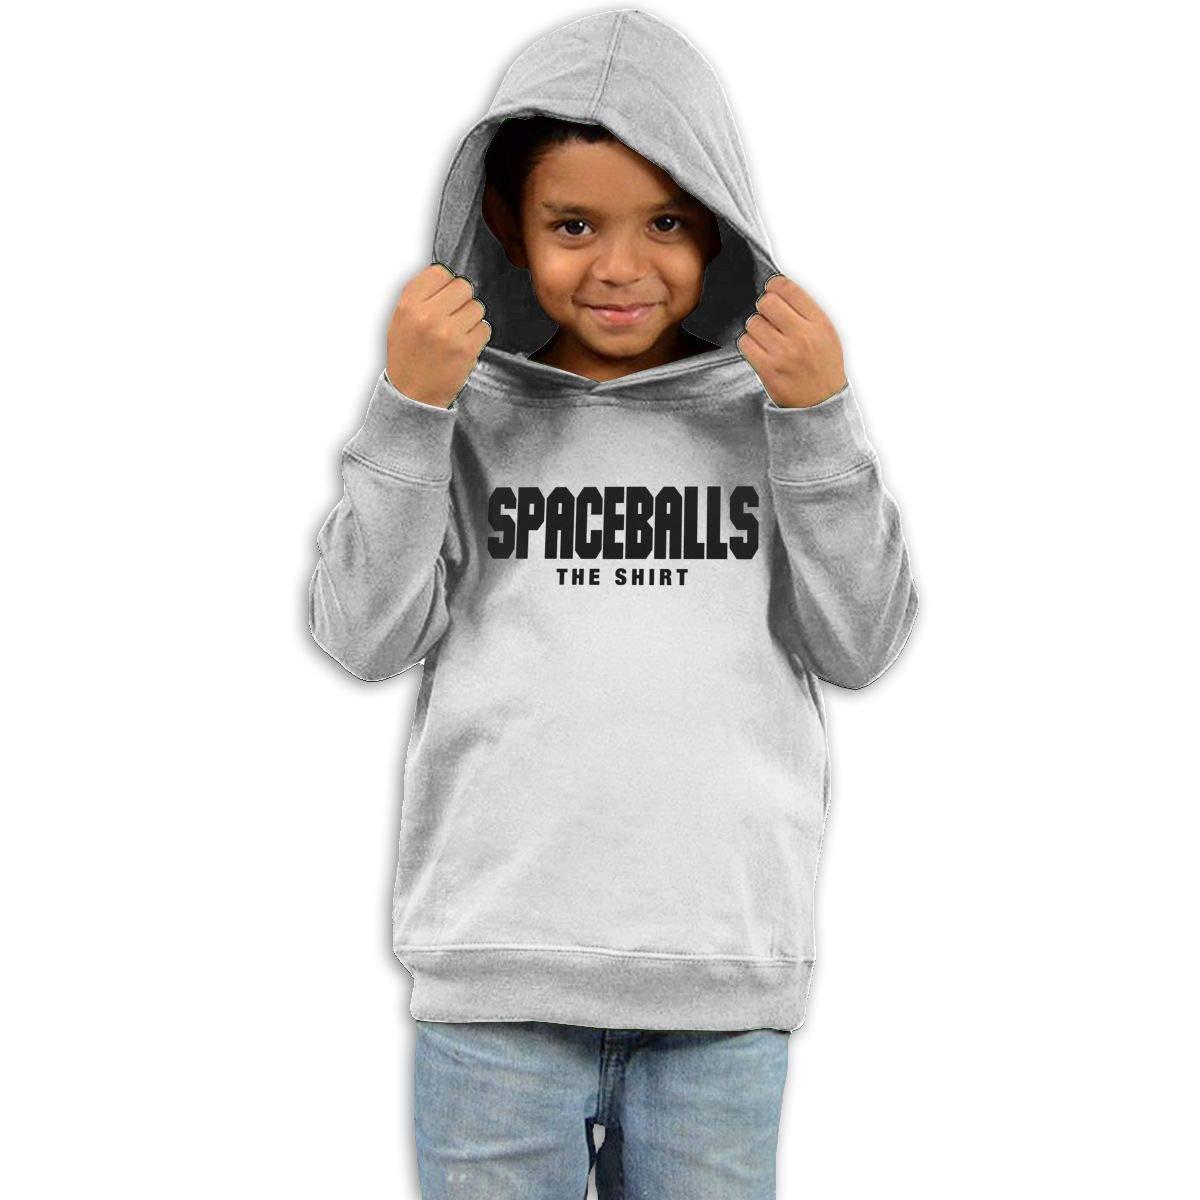 Stacy J. Payne Boys Spaceballs The Shirt Cool Hoody42 White